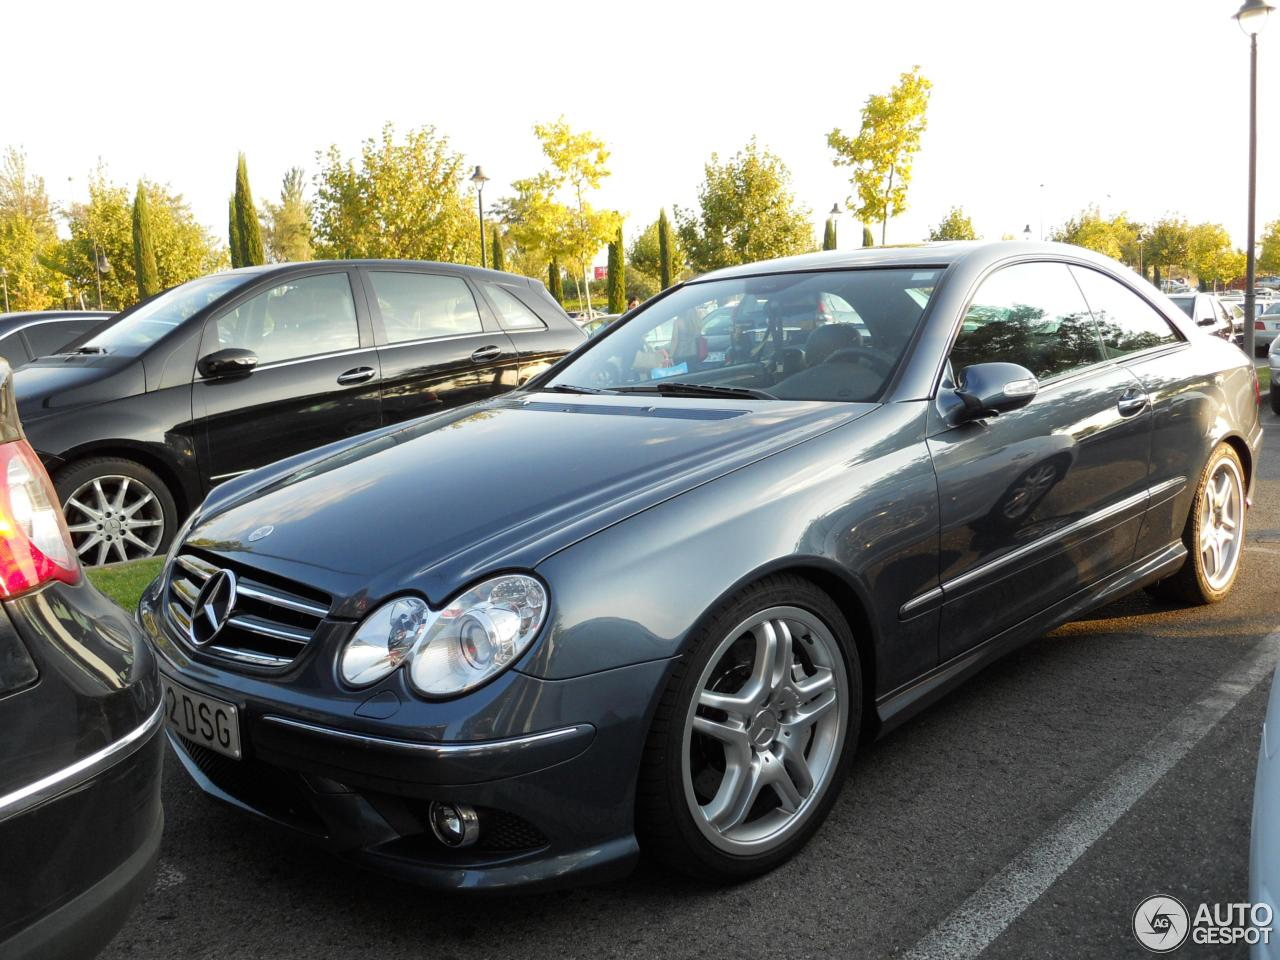 Mercedes benz clk 55 amg 12 dcembre 2012 autogespot for Mercedes benz clk 2012